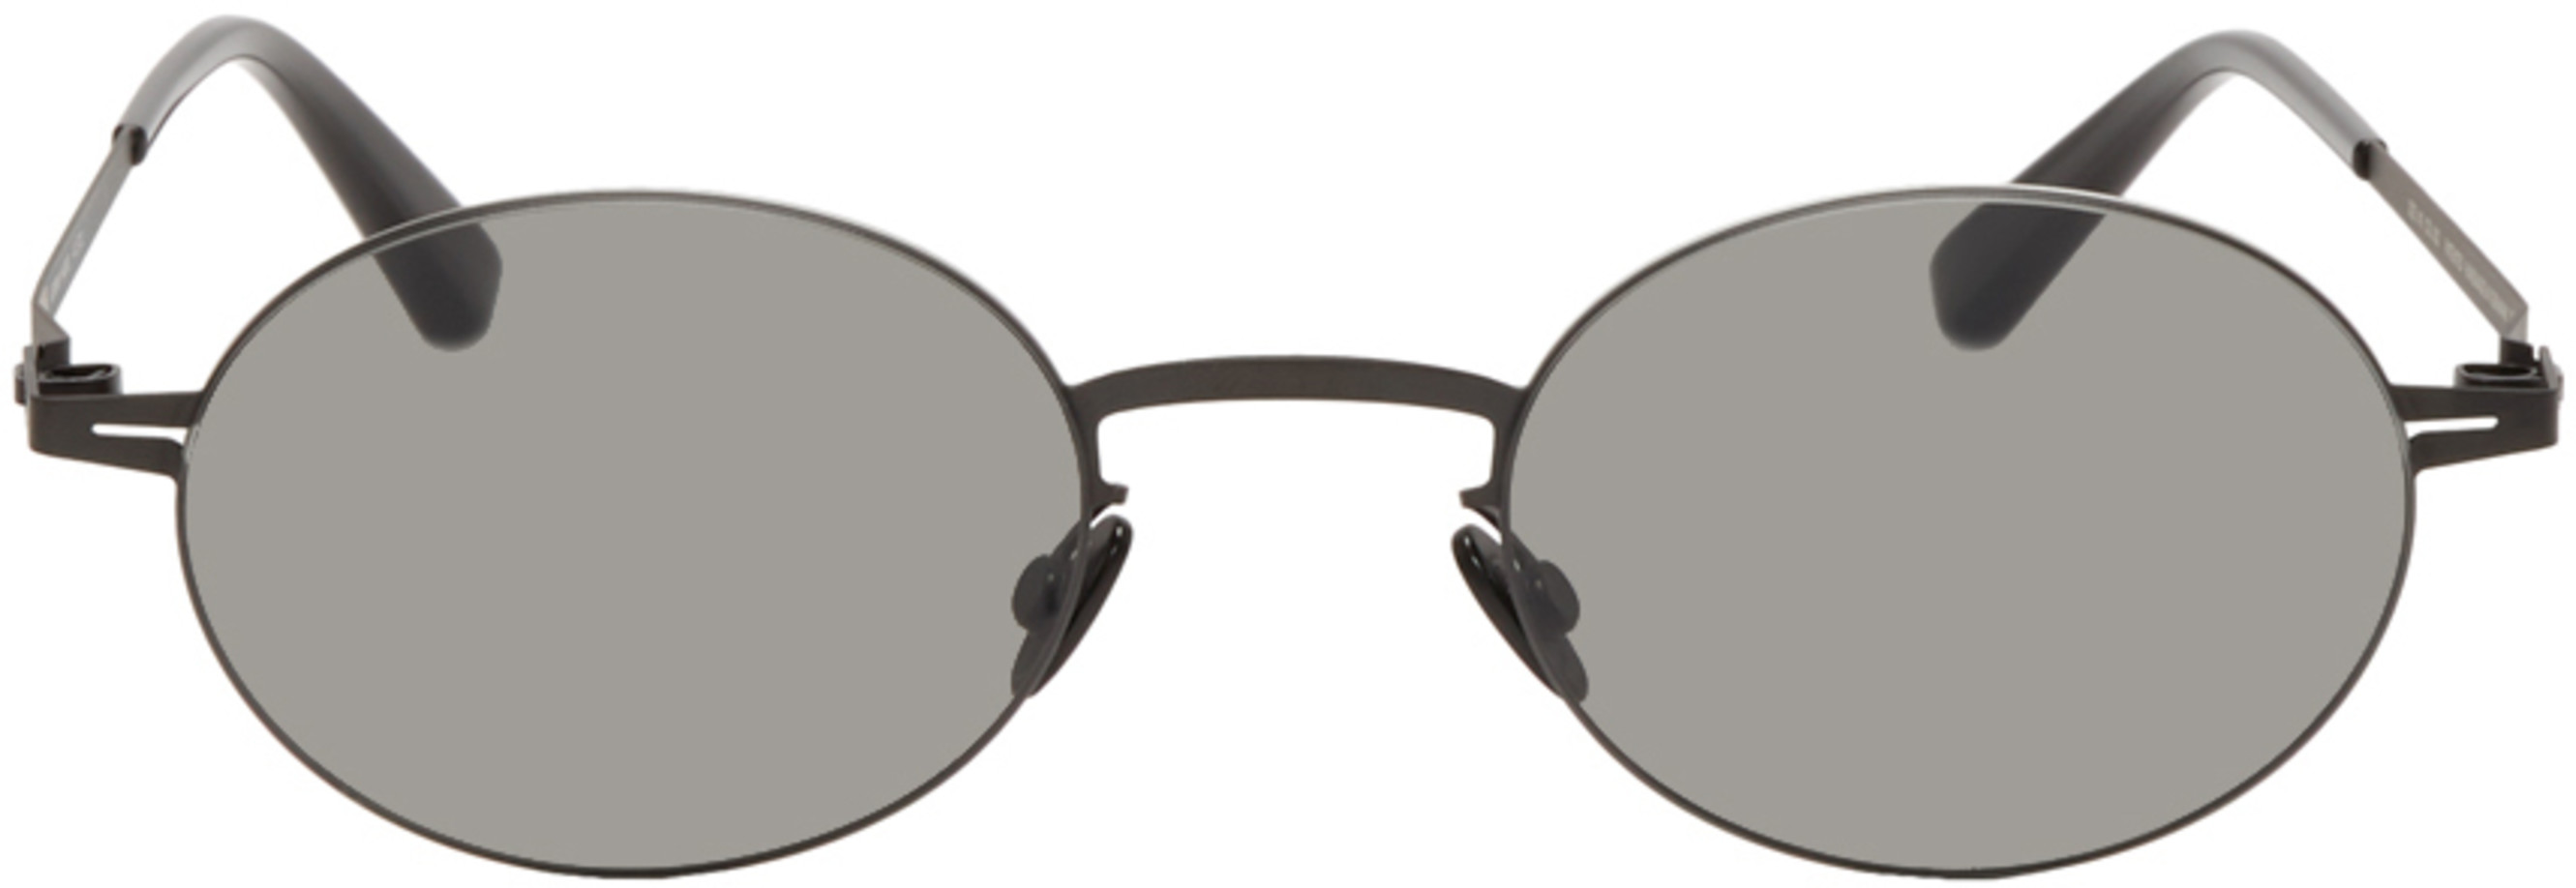 12408f9b42b5 Designer eyewear for Men